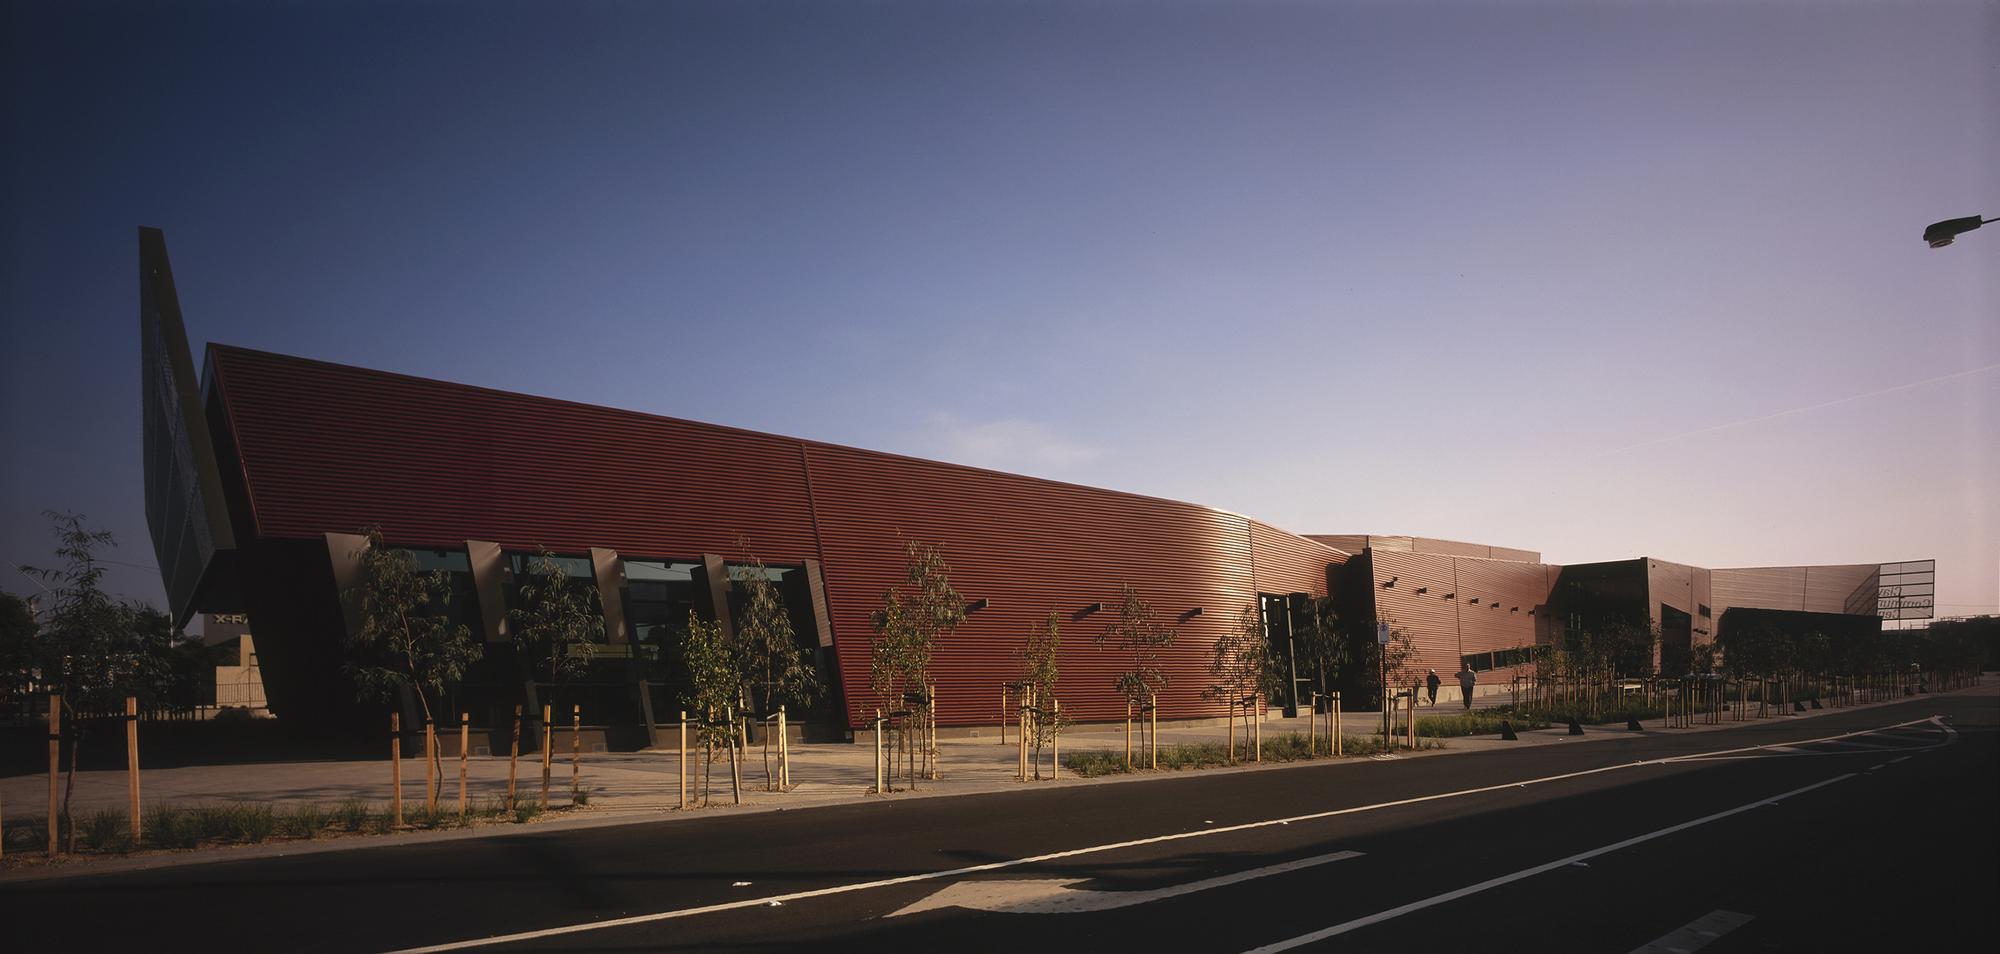 Clayton Community Centre / Jackson Architecture, Courtesy of Archiphoto Pty Ltd.